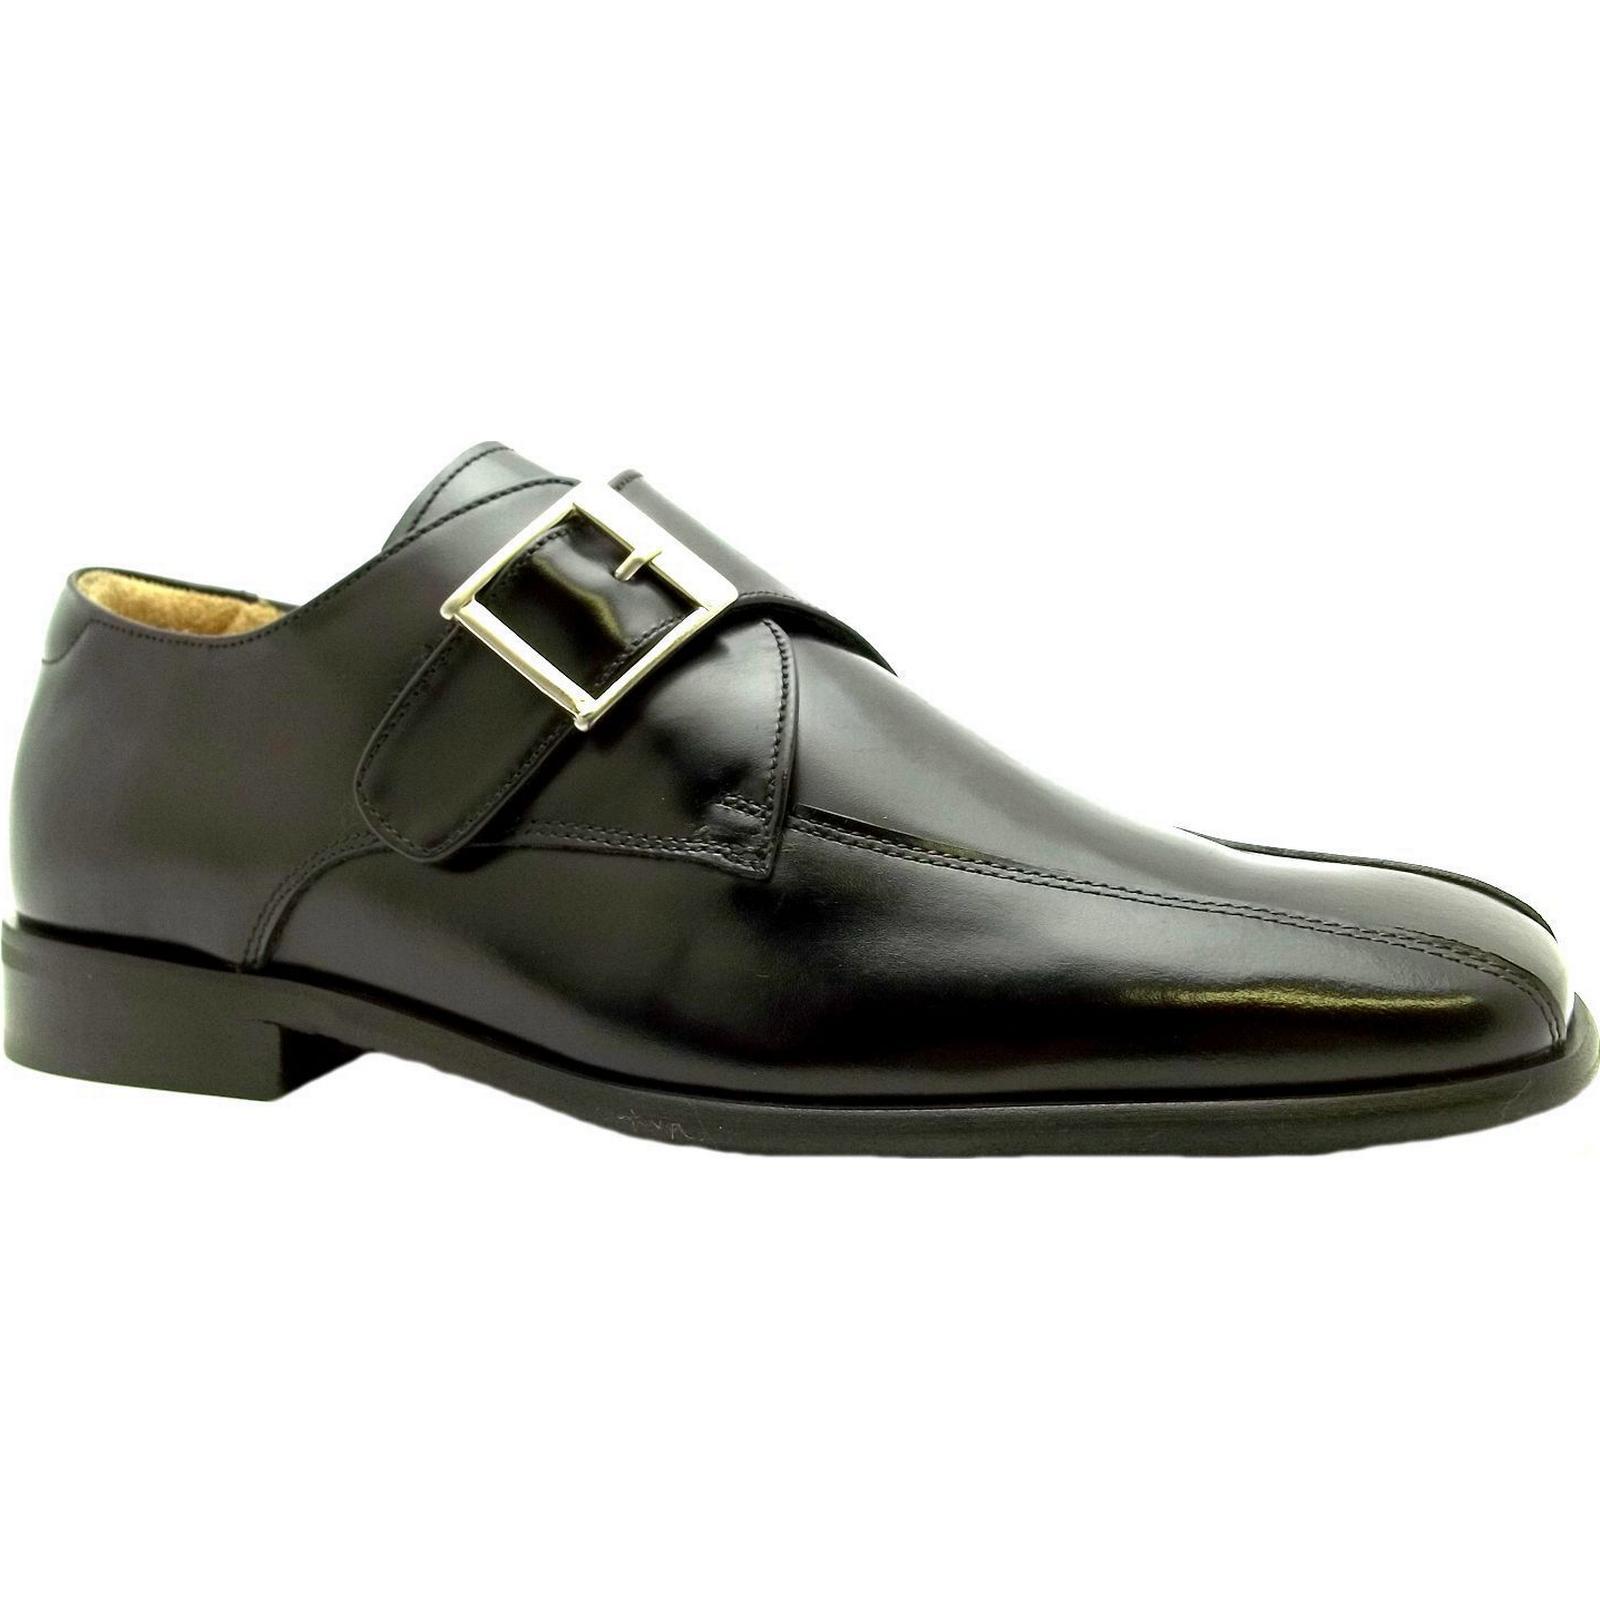 Man's/Woman's:Petasil Man's/Woman's:Petasil Man's/Woman's:Petasil Cipriani Formal Shoes:Seasonal Promotion c3e7fe